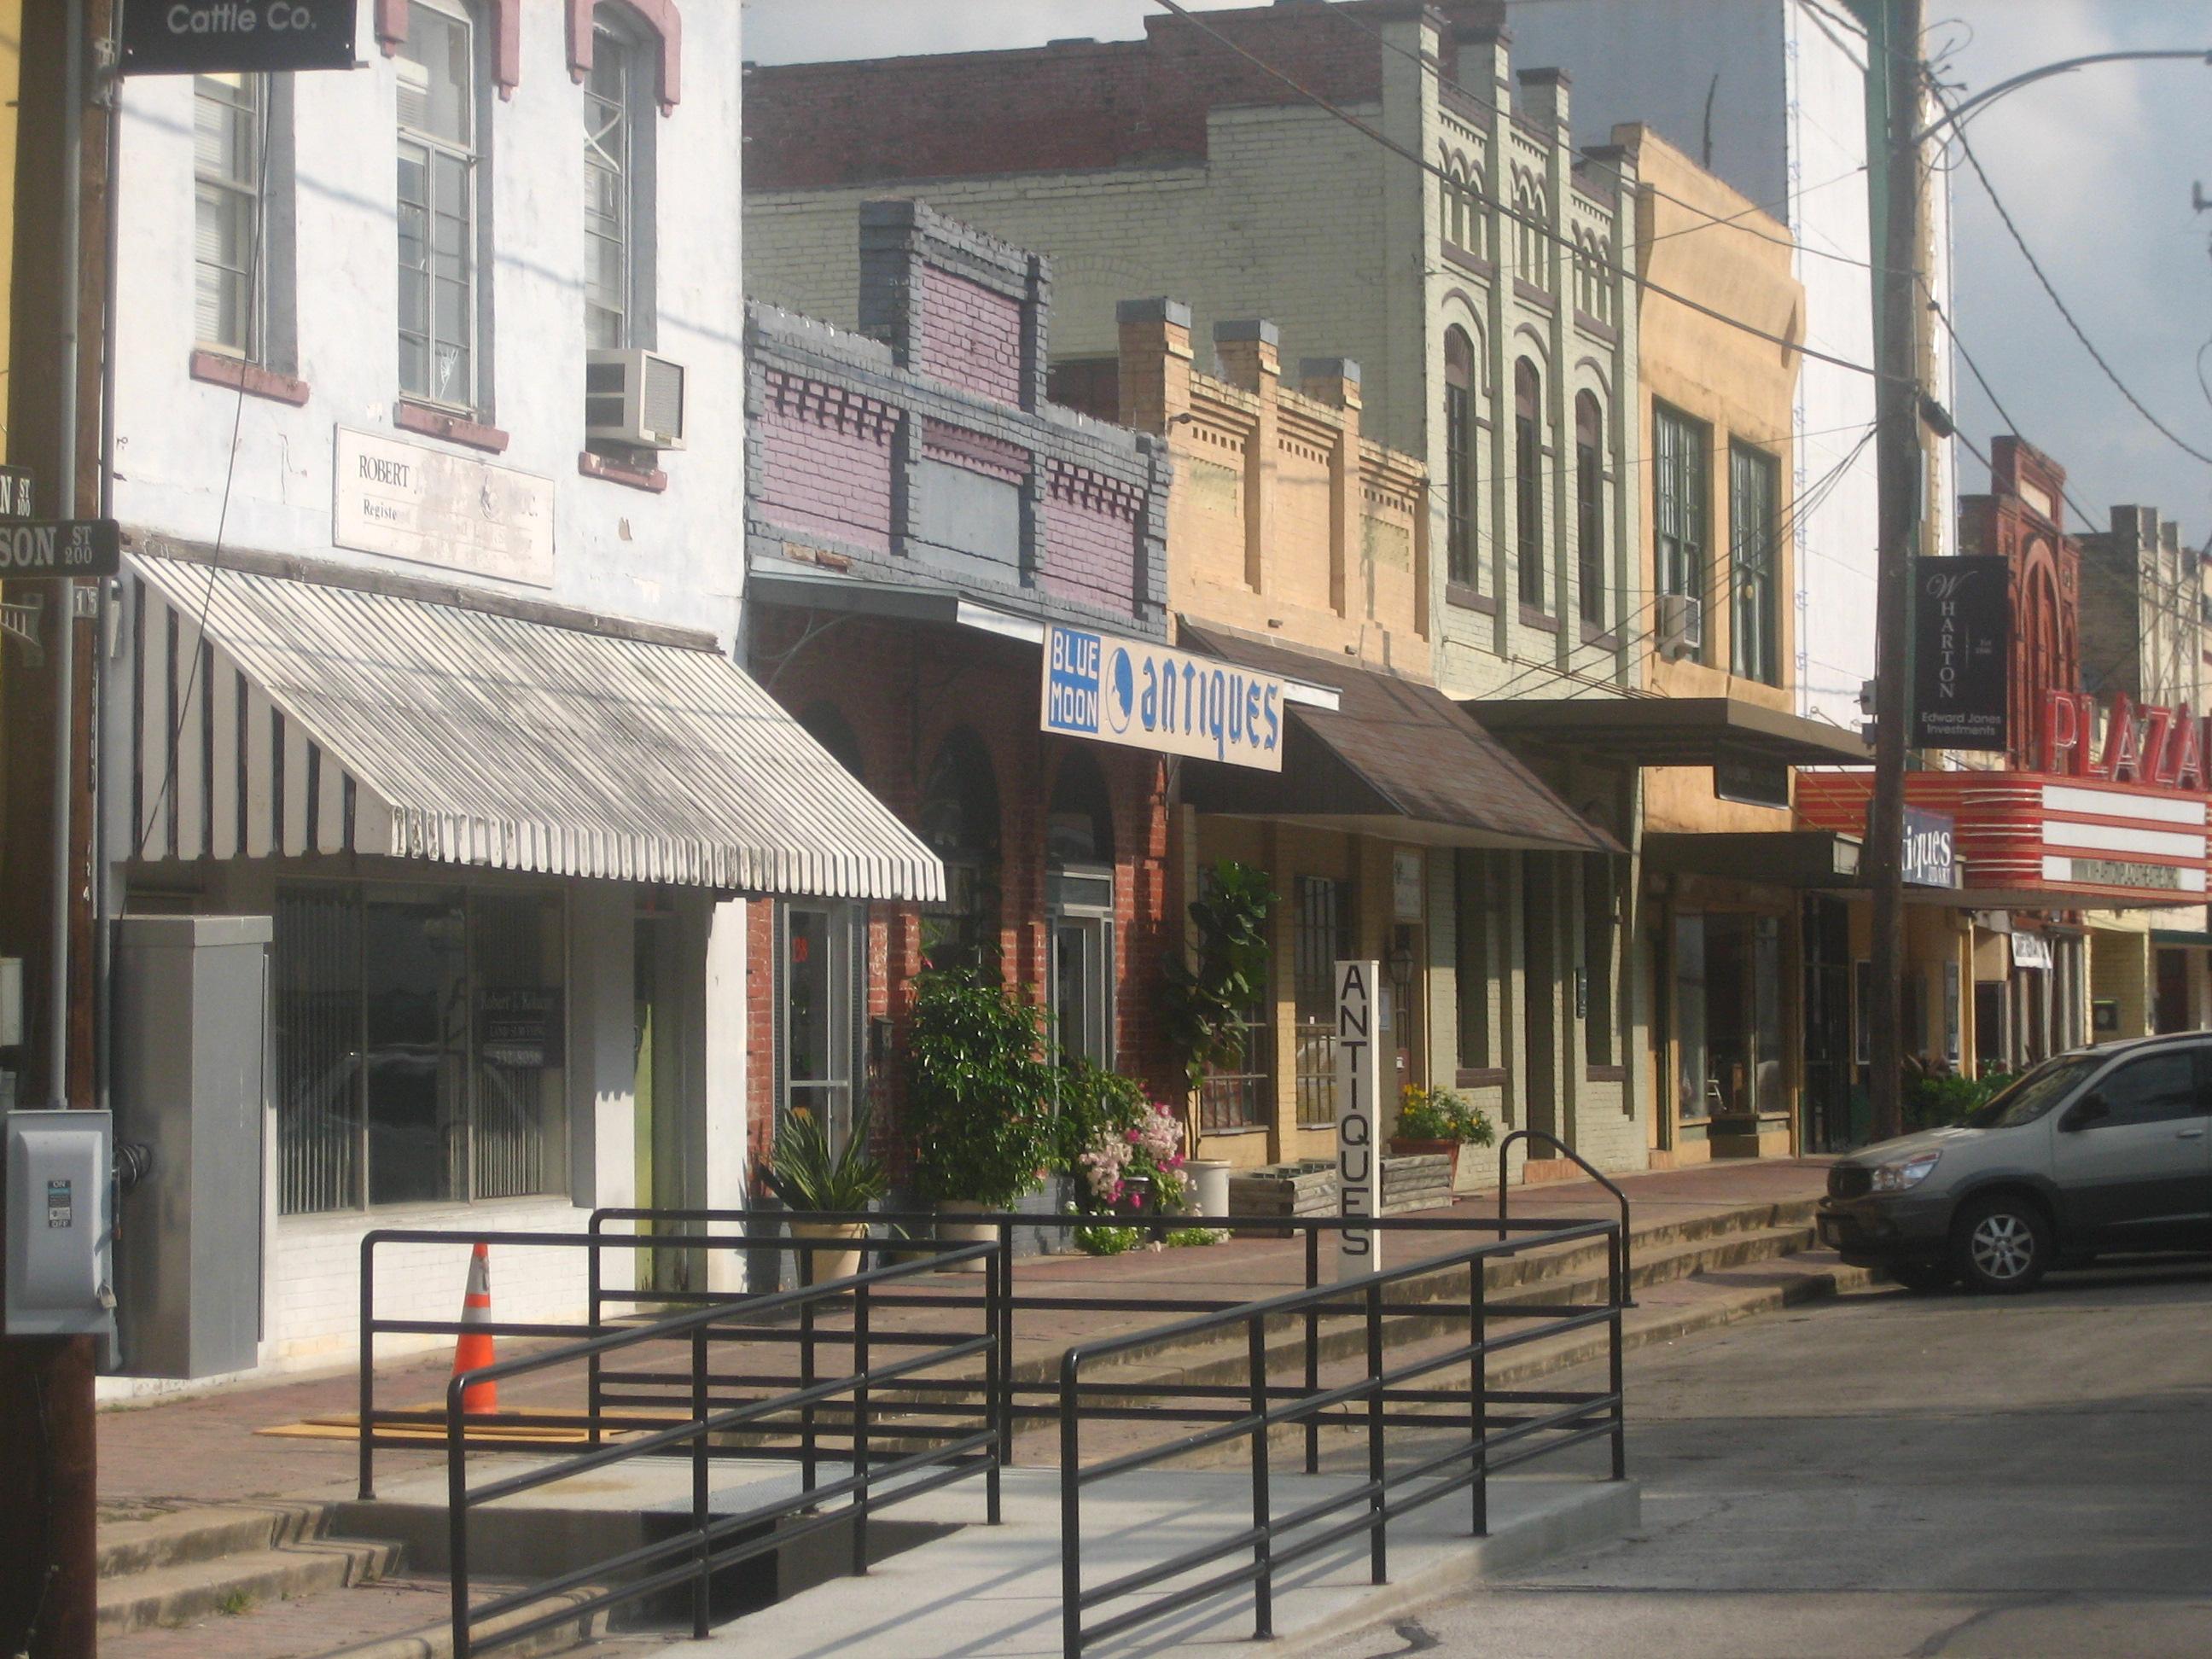 FileDowntown Wharton TX IMG 1031JPG  Wikimedia Commons